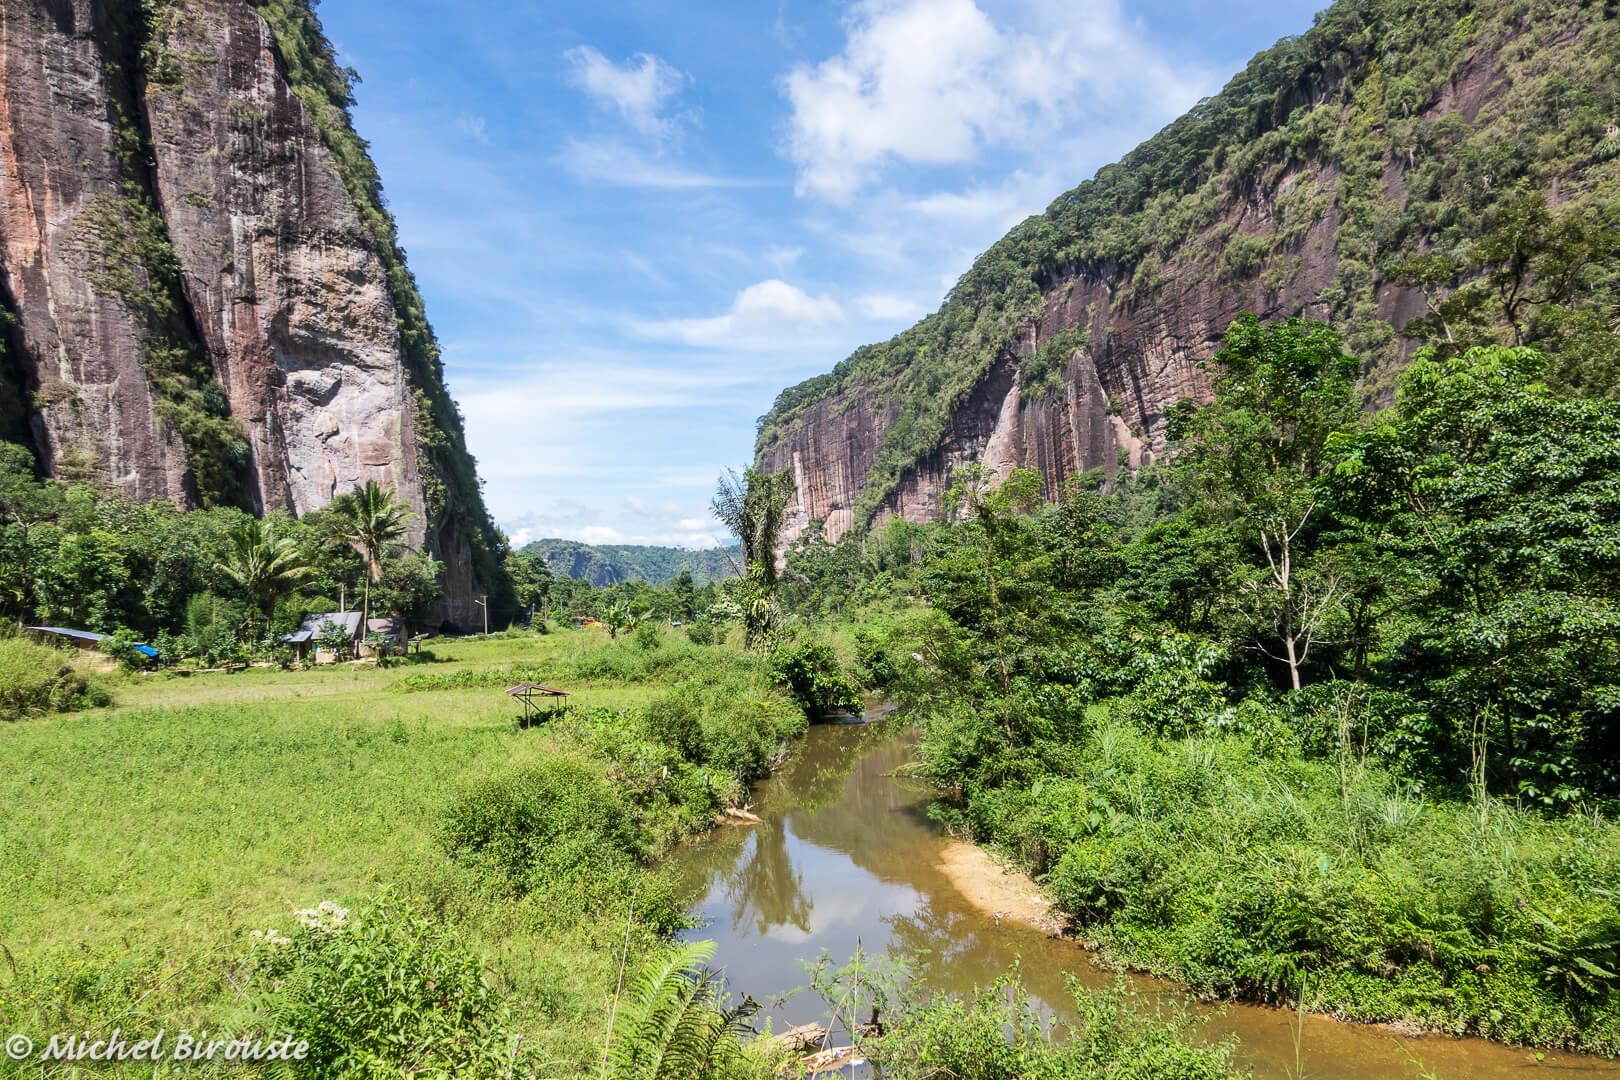 Indonesie-formalites-Sumatra-balade-paysage-vegetation-nature